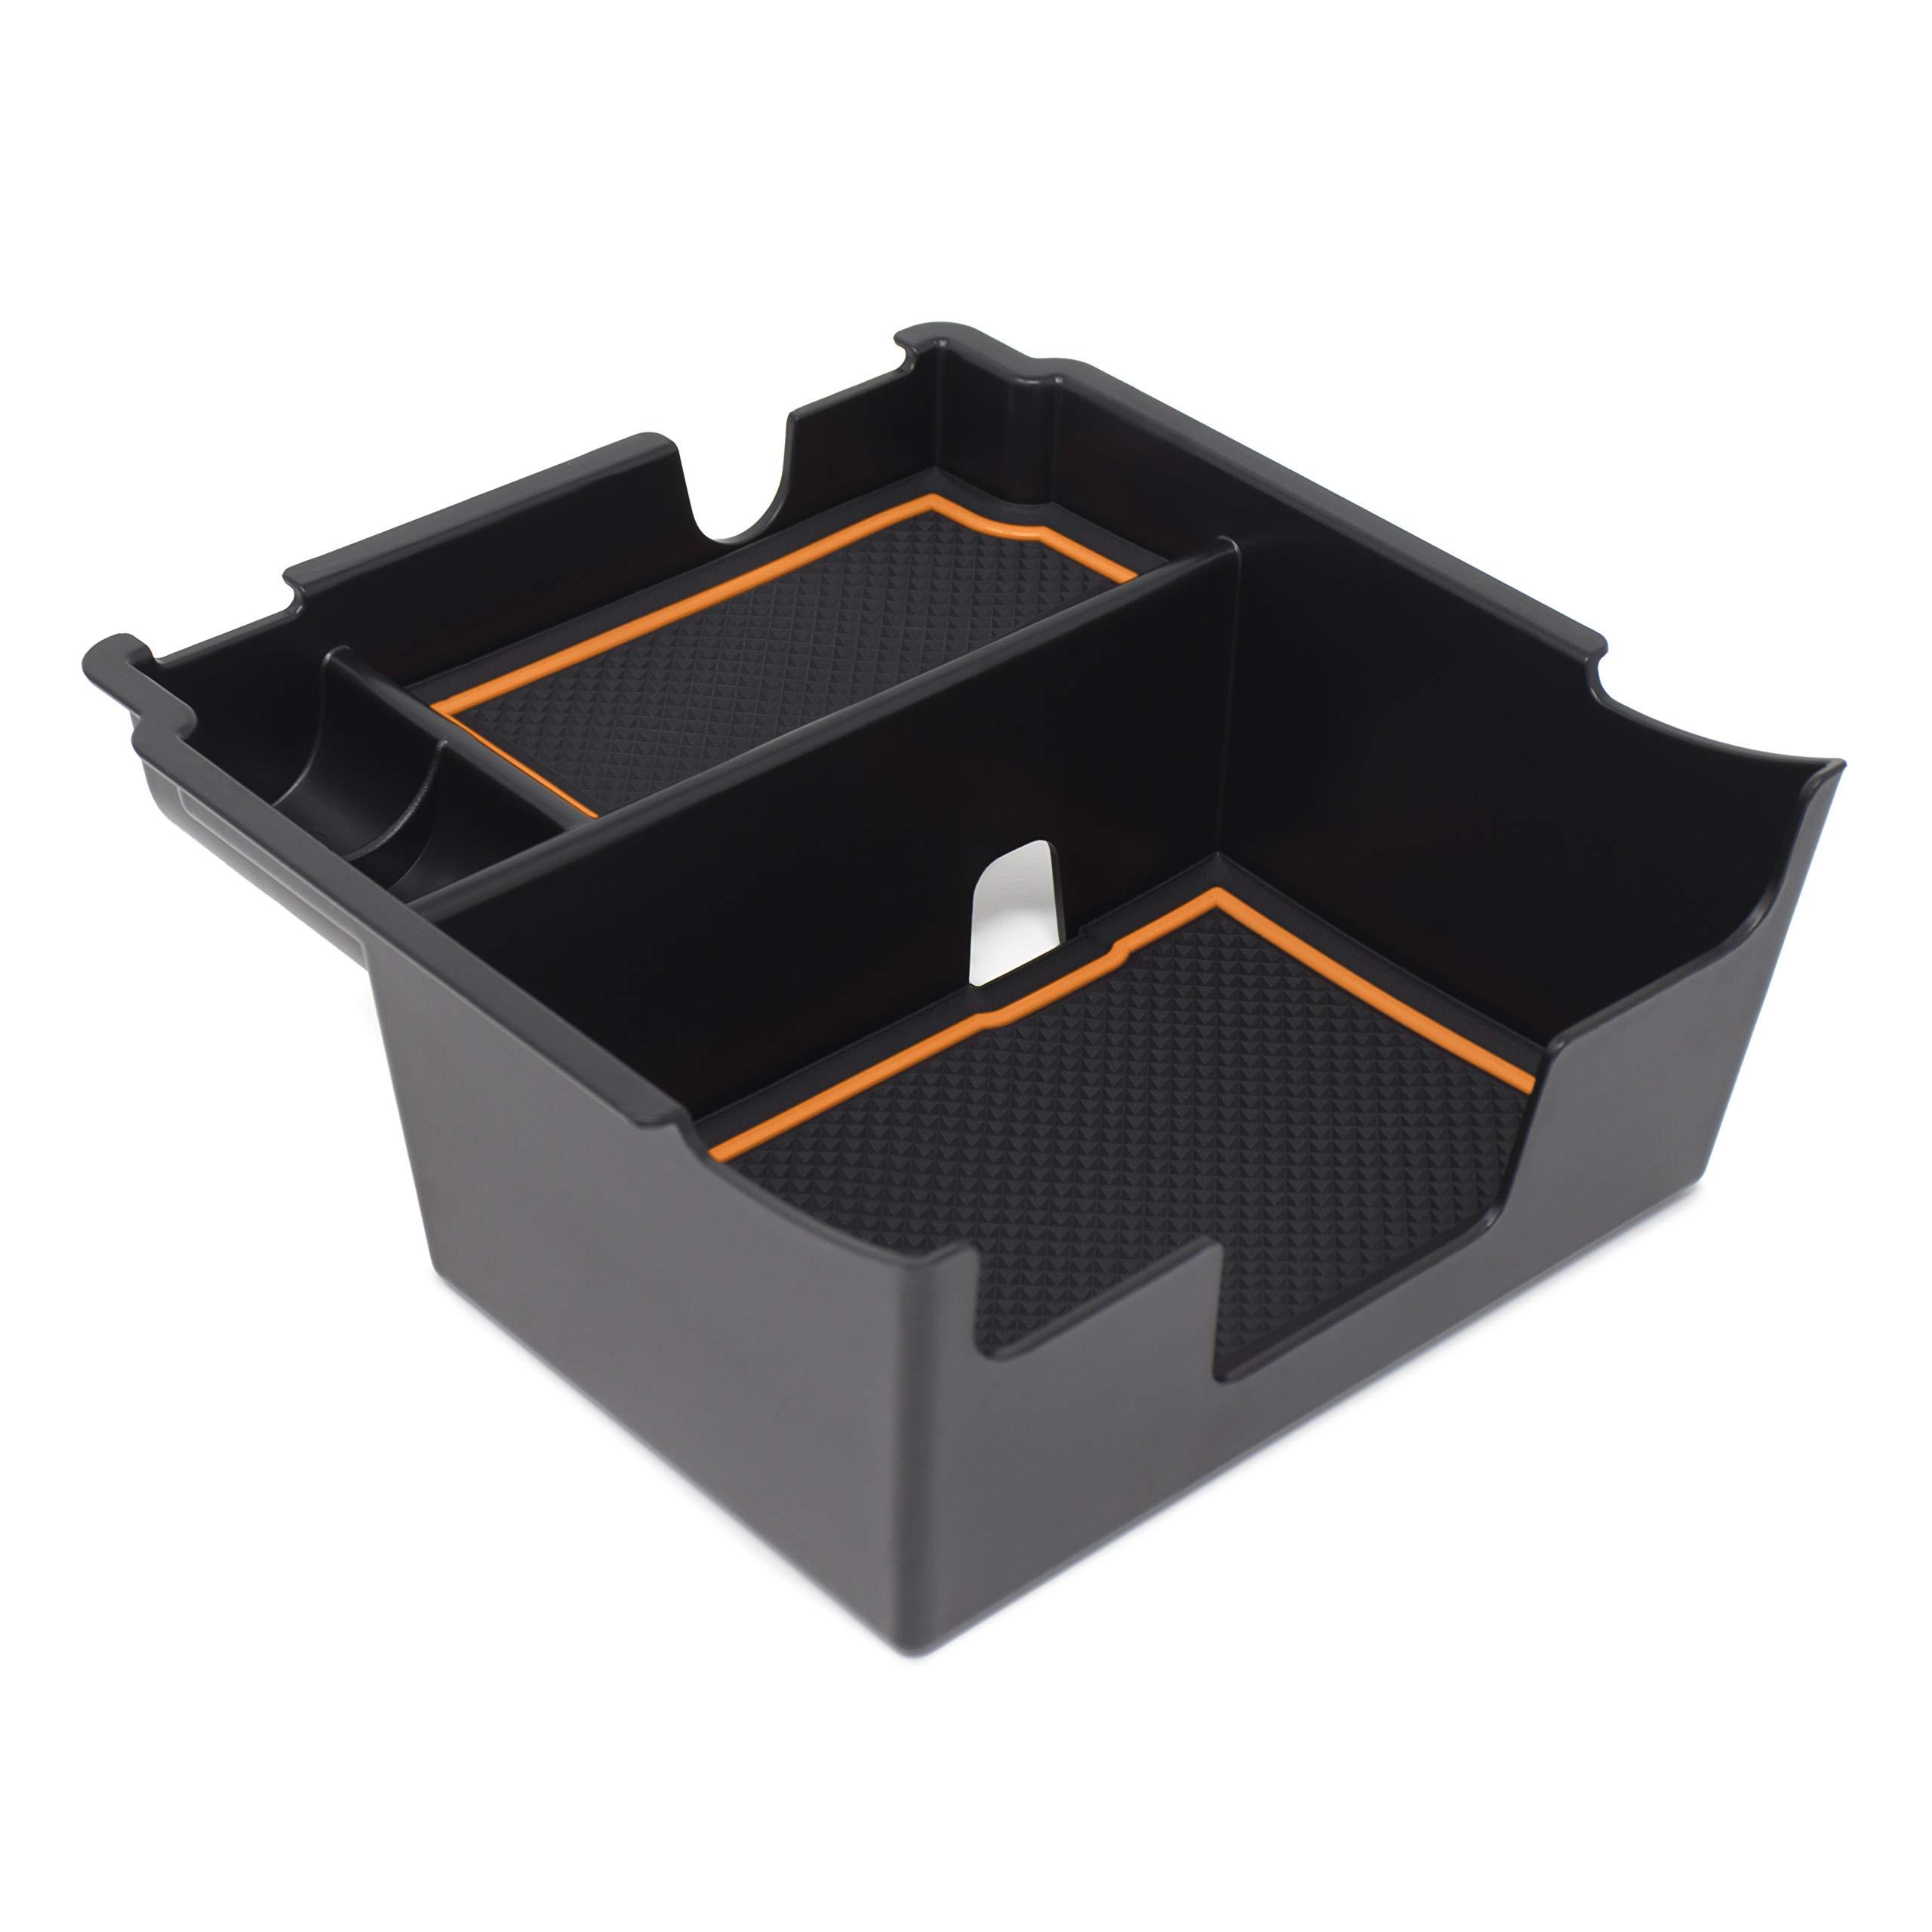 Custom Fit Center Console Armrest Organizer Accessories for 2018 2019 Subaru Crosstrek and Impreza (Orange Trim) by CupHolderHero